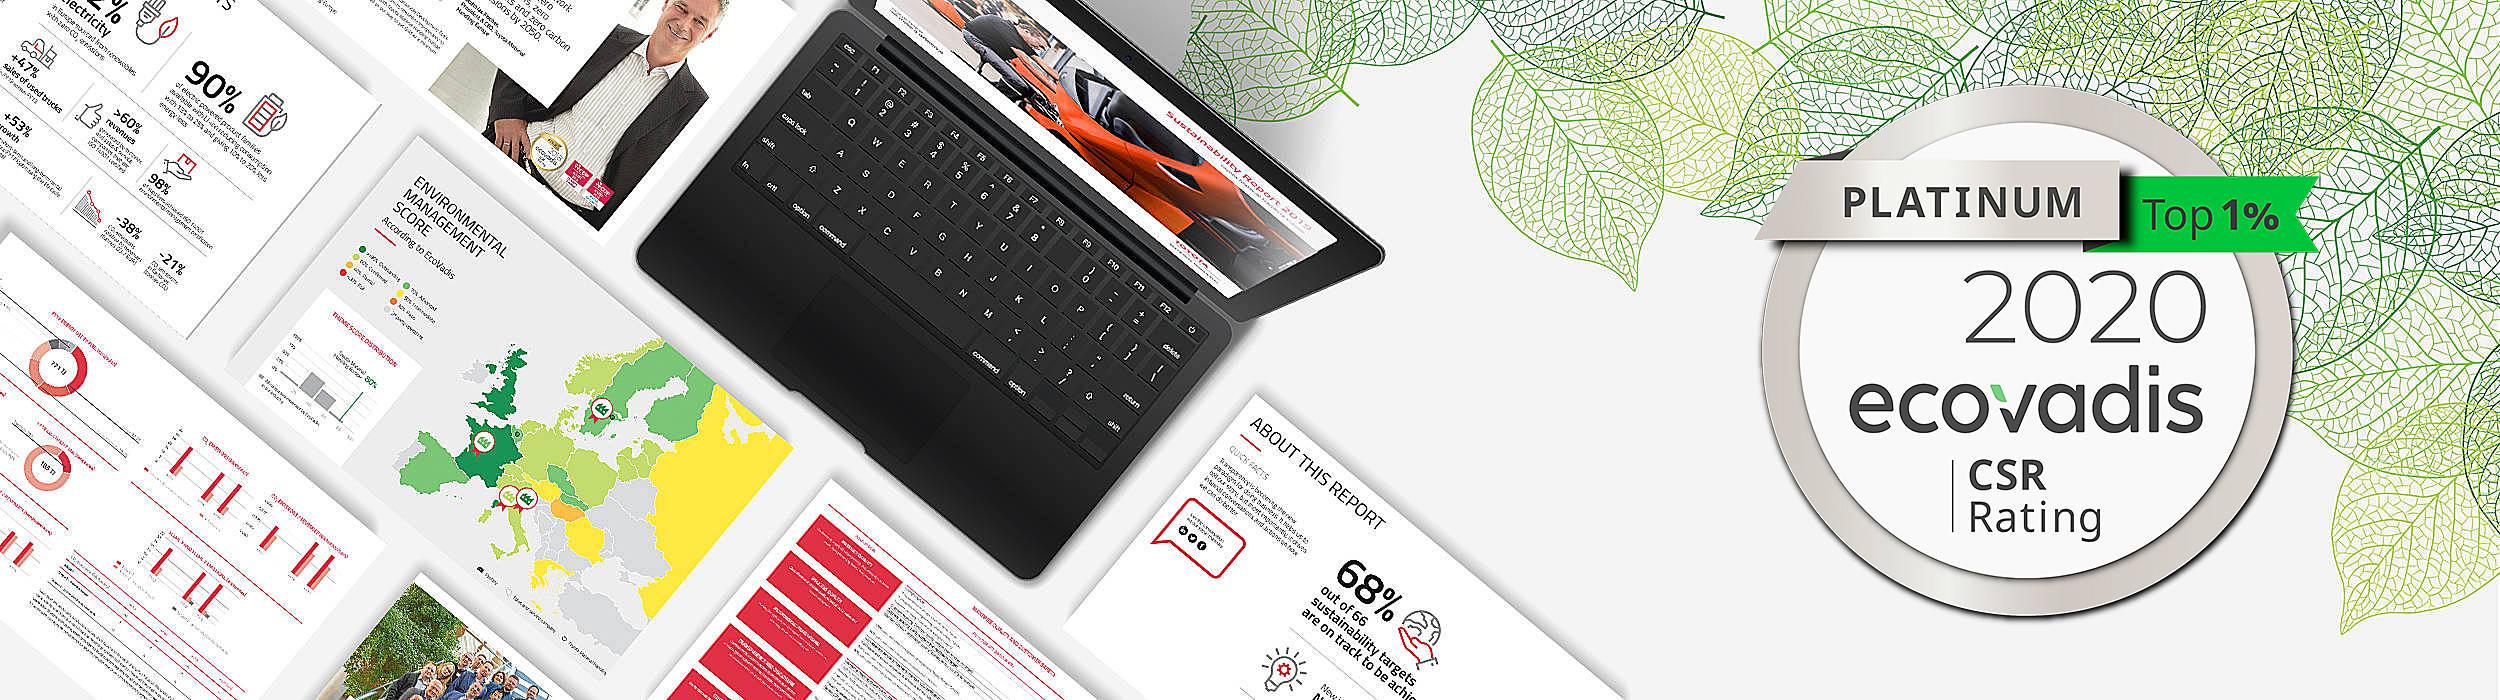 EcoVadis CSR Platinum - Toyota Material Handling